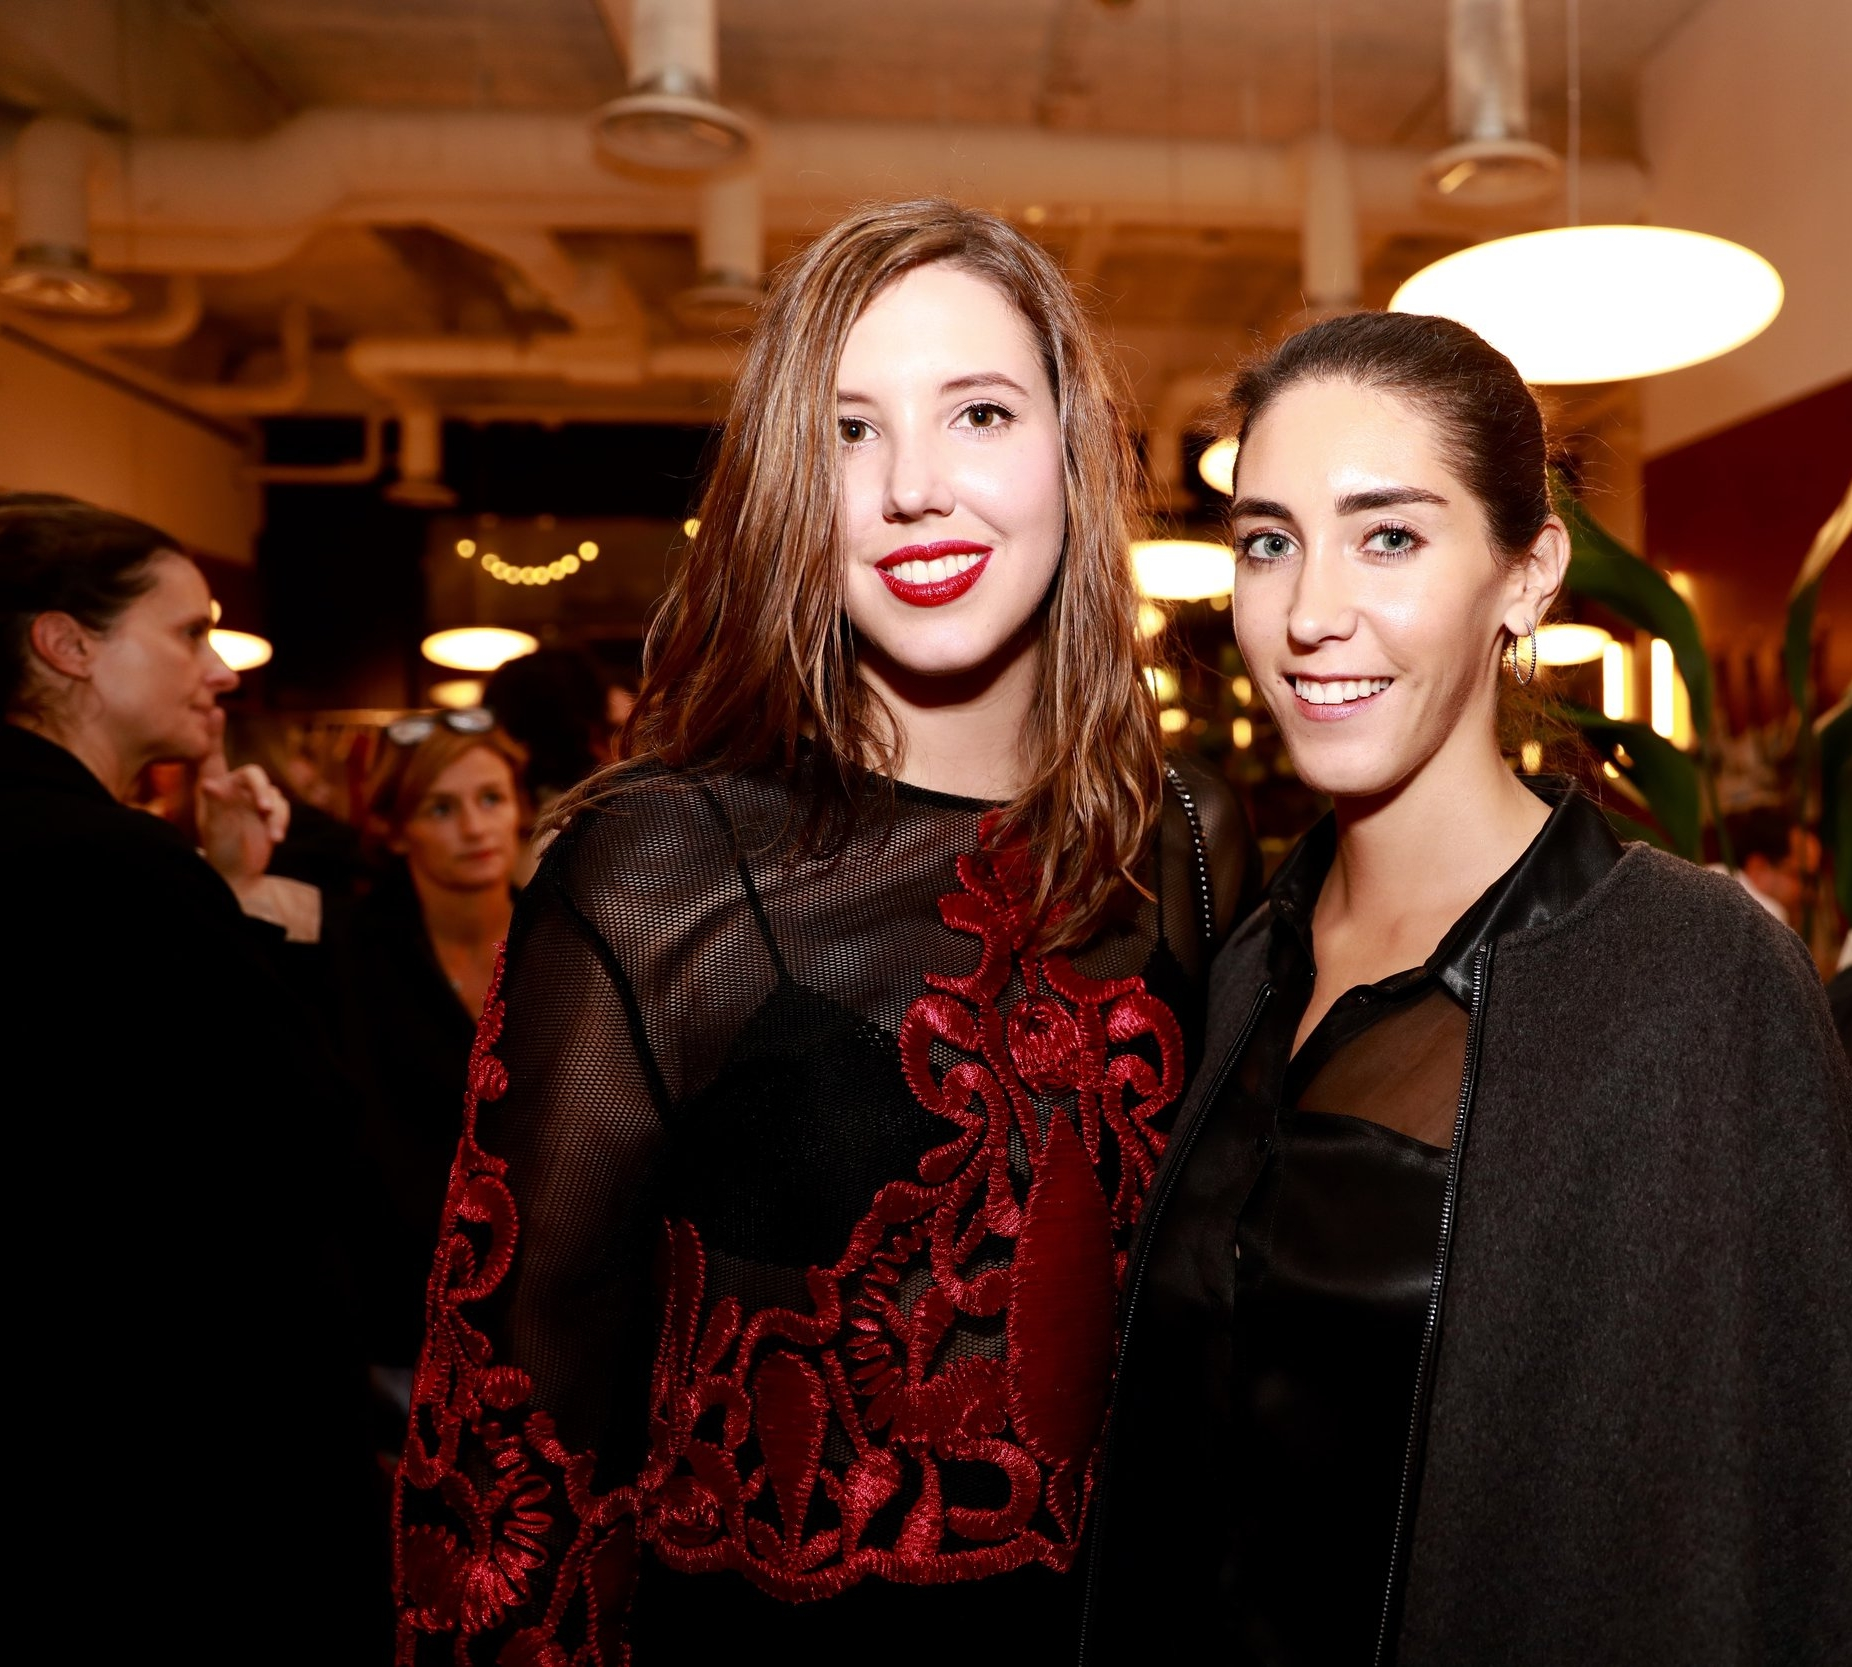 Bureau Estrée Latin Connection Farida Tir Teerlinck Fashion Design Paris Agency